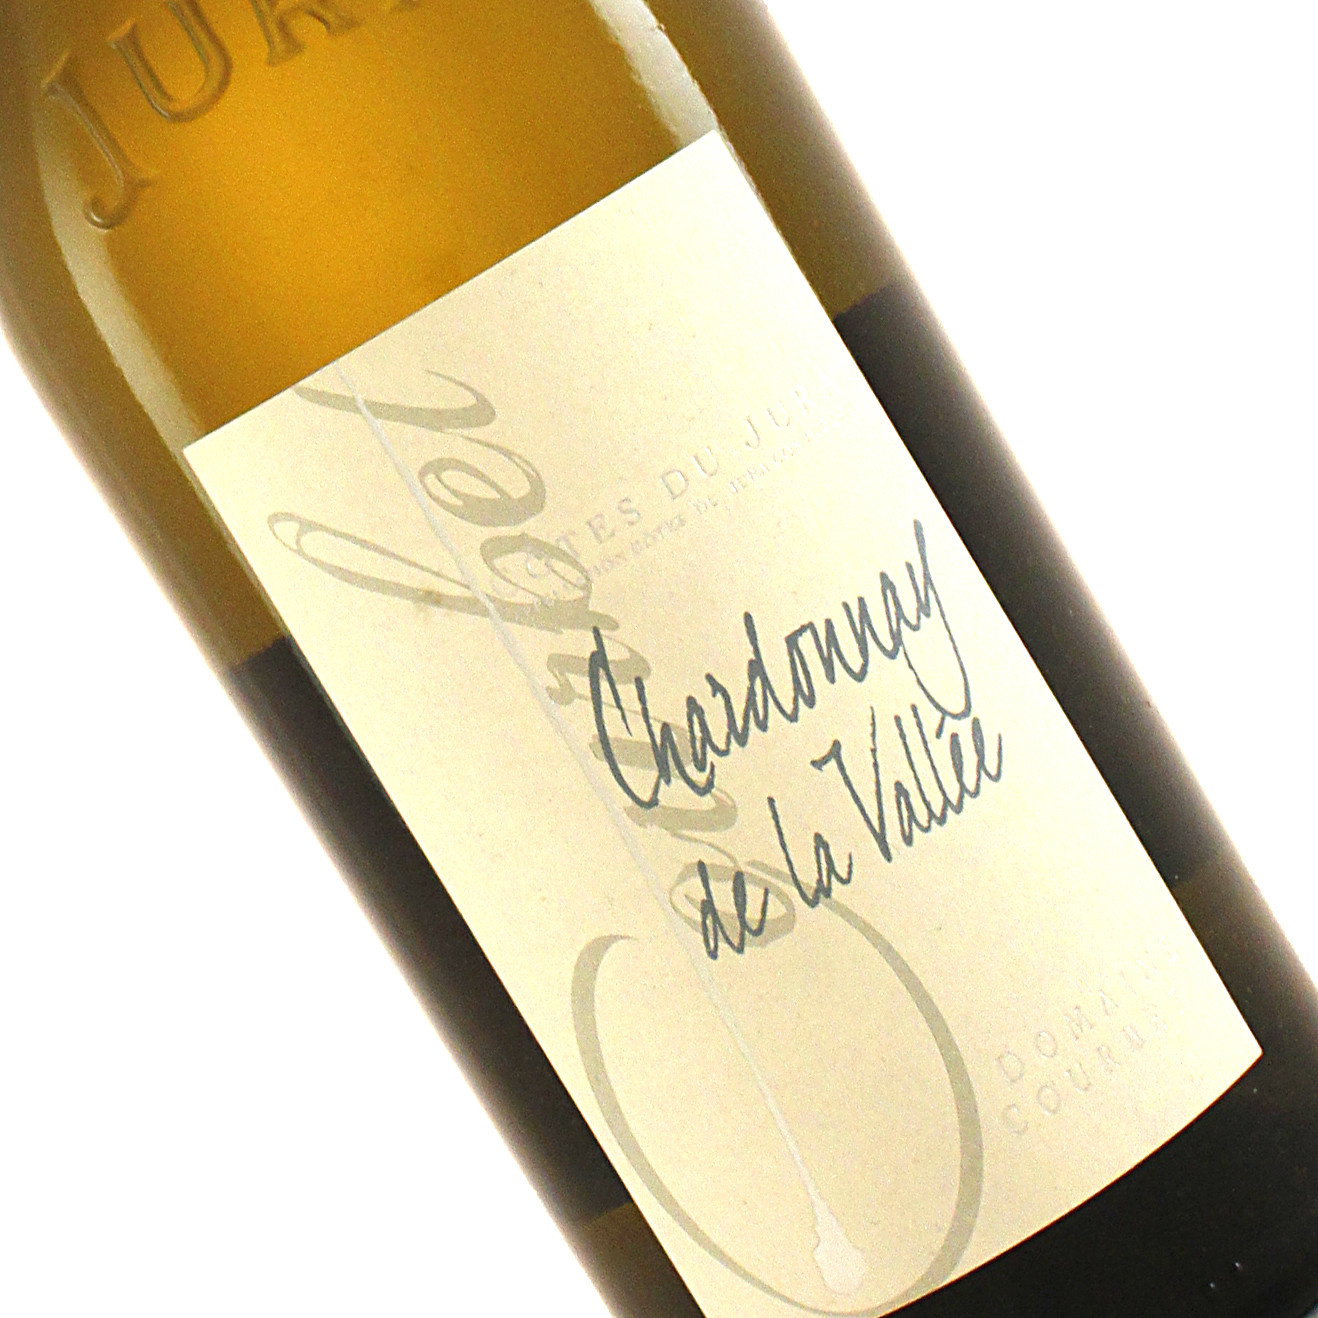 Domaine Courbet 2018 Chardonnay de la Vallee, Jura